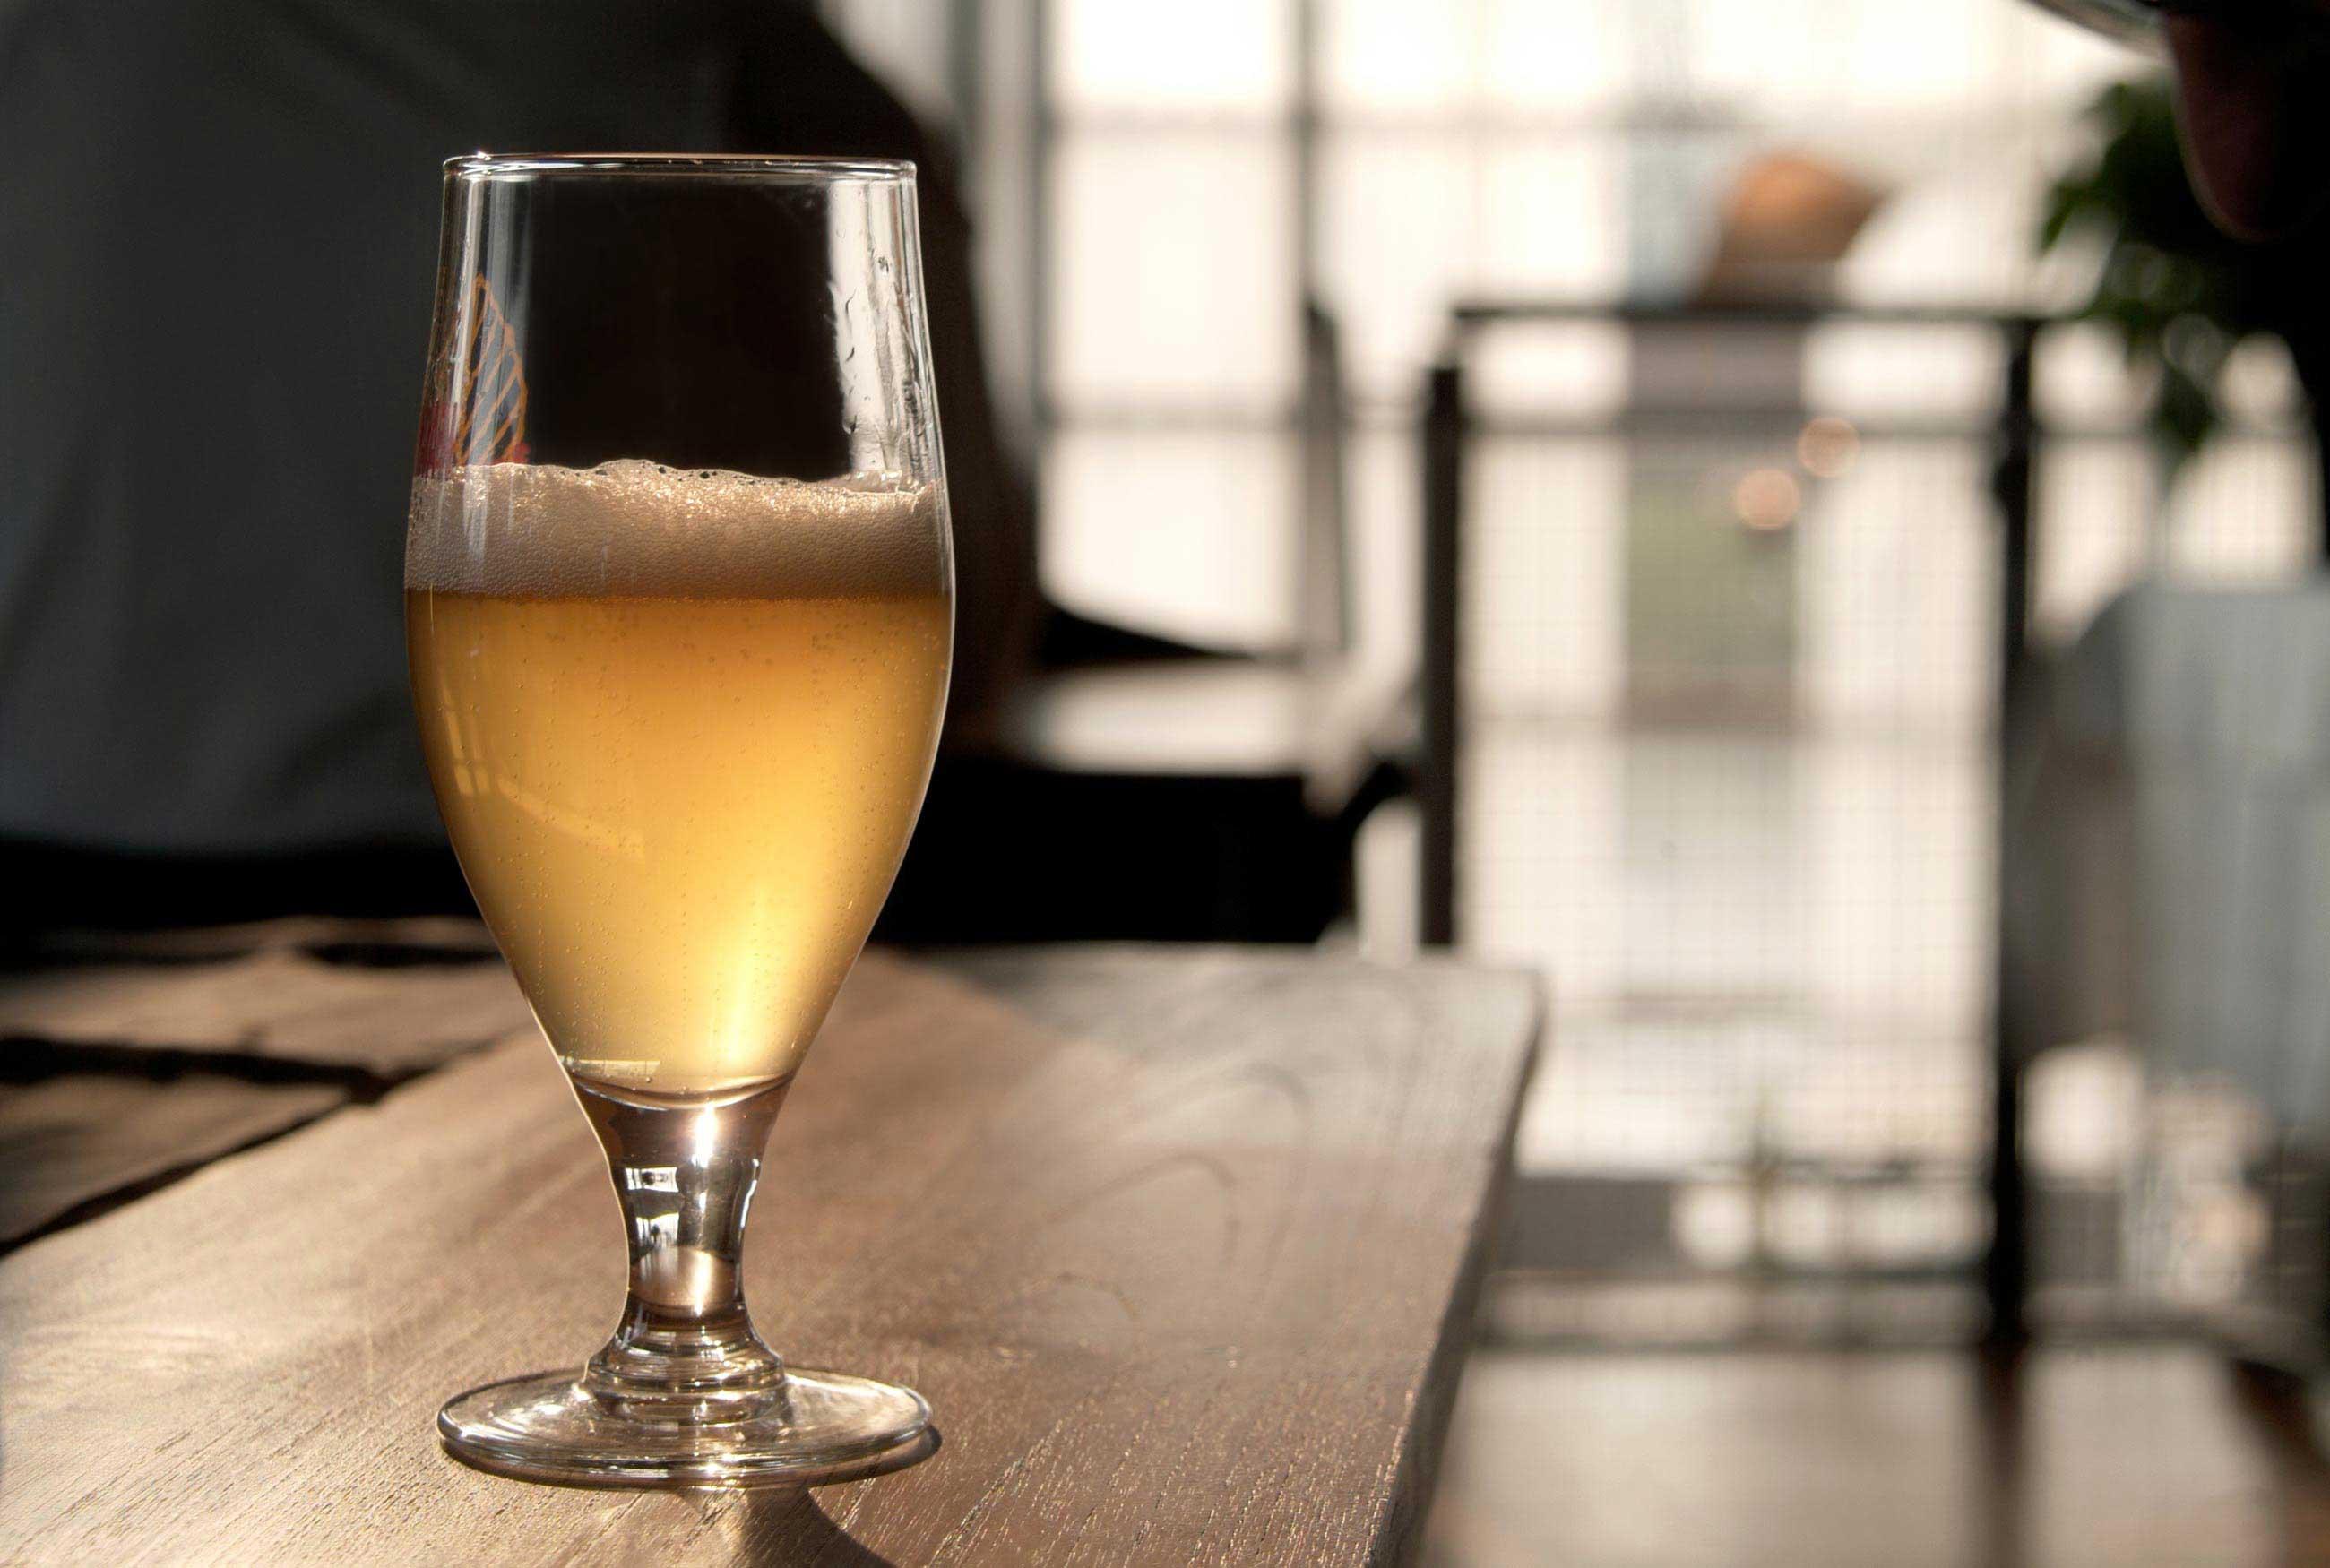 Degustar uma boa cerveja